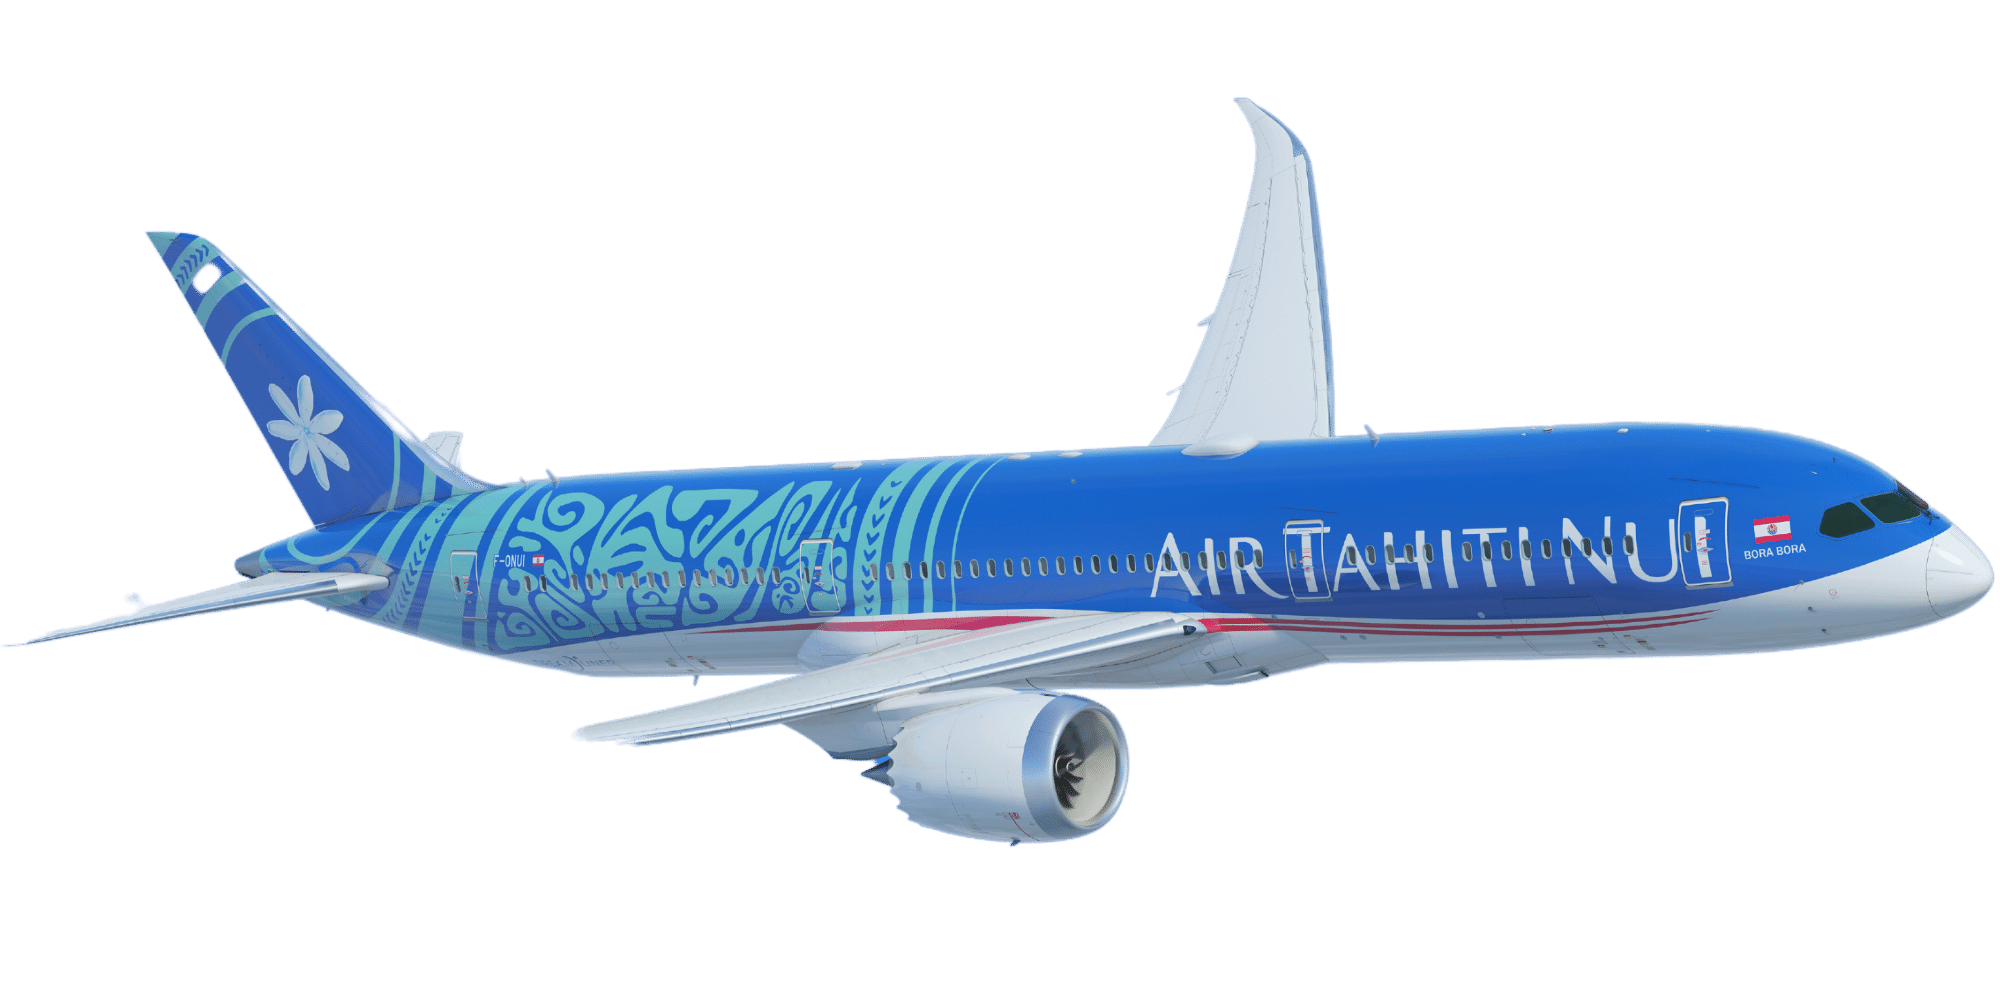 Resize Air Tahiti Nui plane transparent